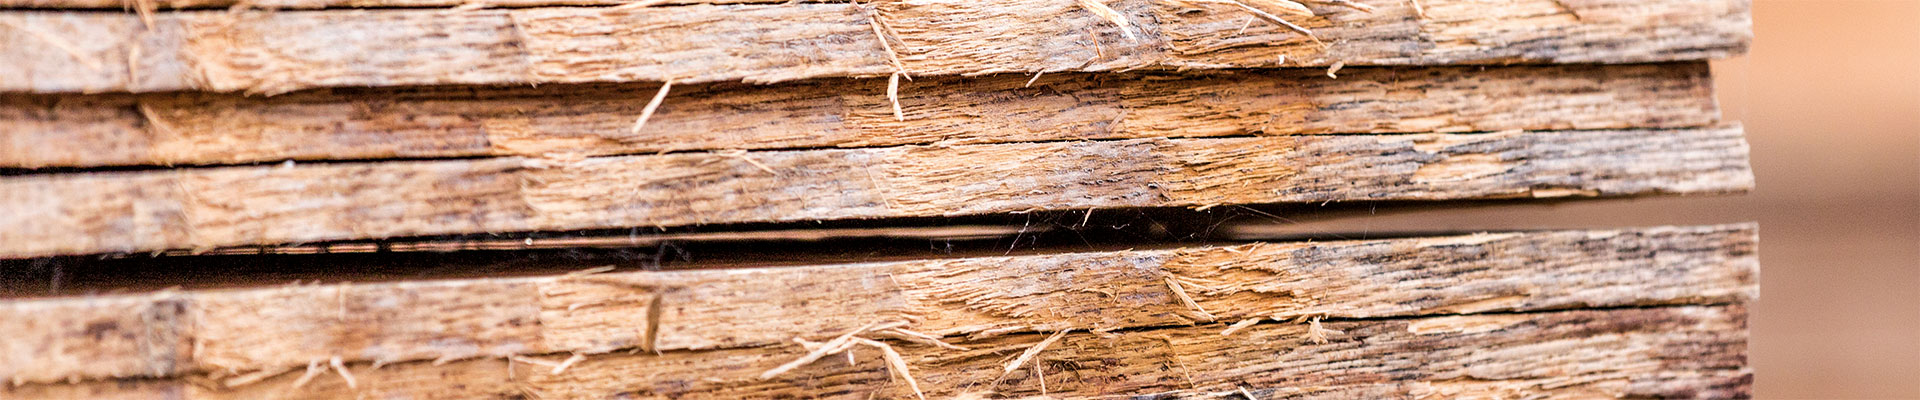 Eiken Boomstammen Te Koop.Eiken Boolhout Carpentier Hardwood Solutions